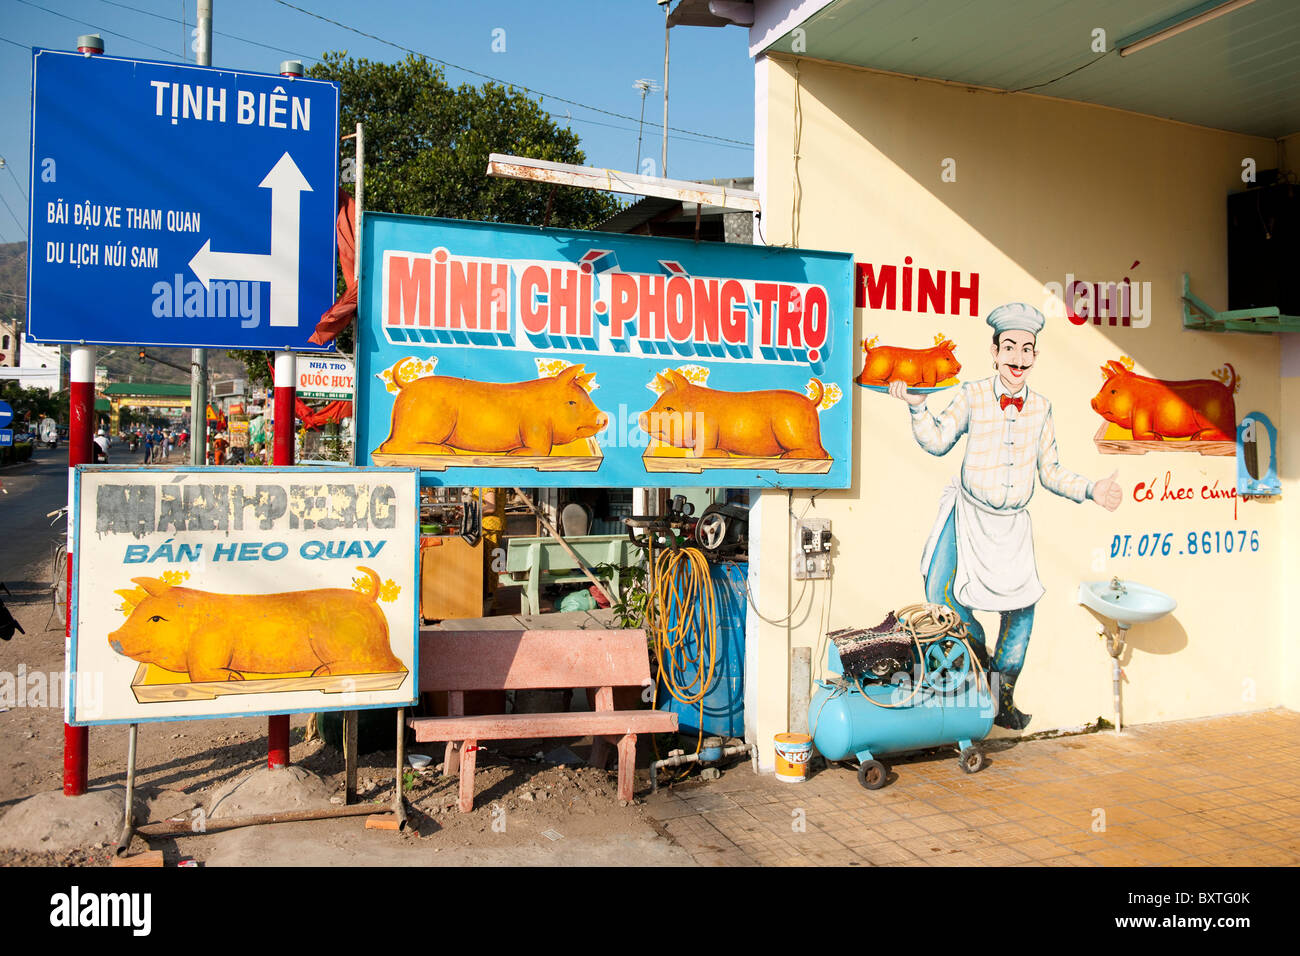 street scene, Mekong Delta, Chau Doc, Vietnam - Stock Image